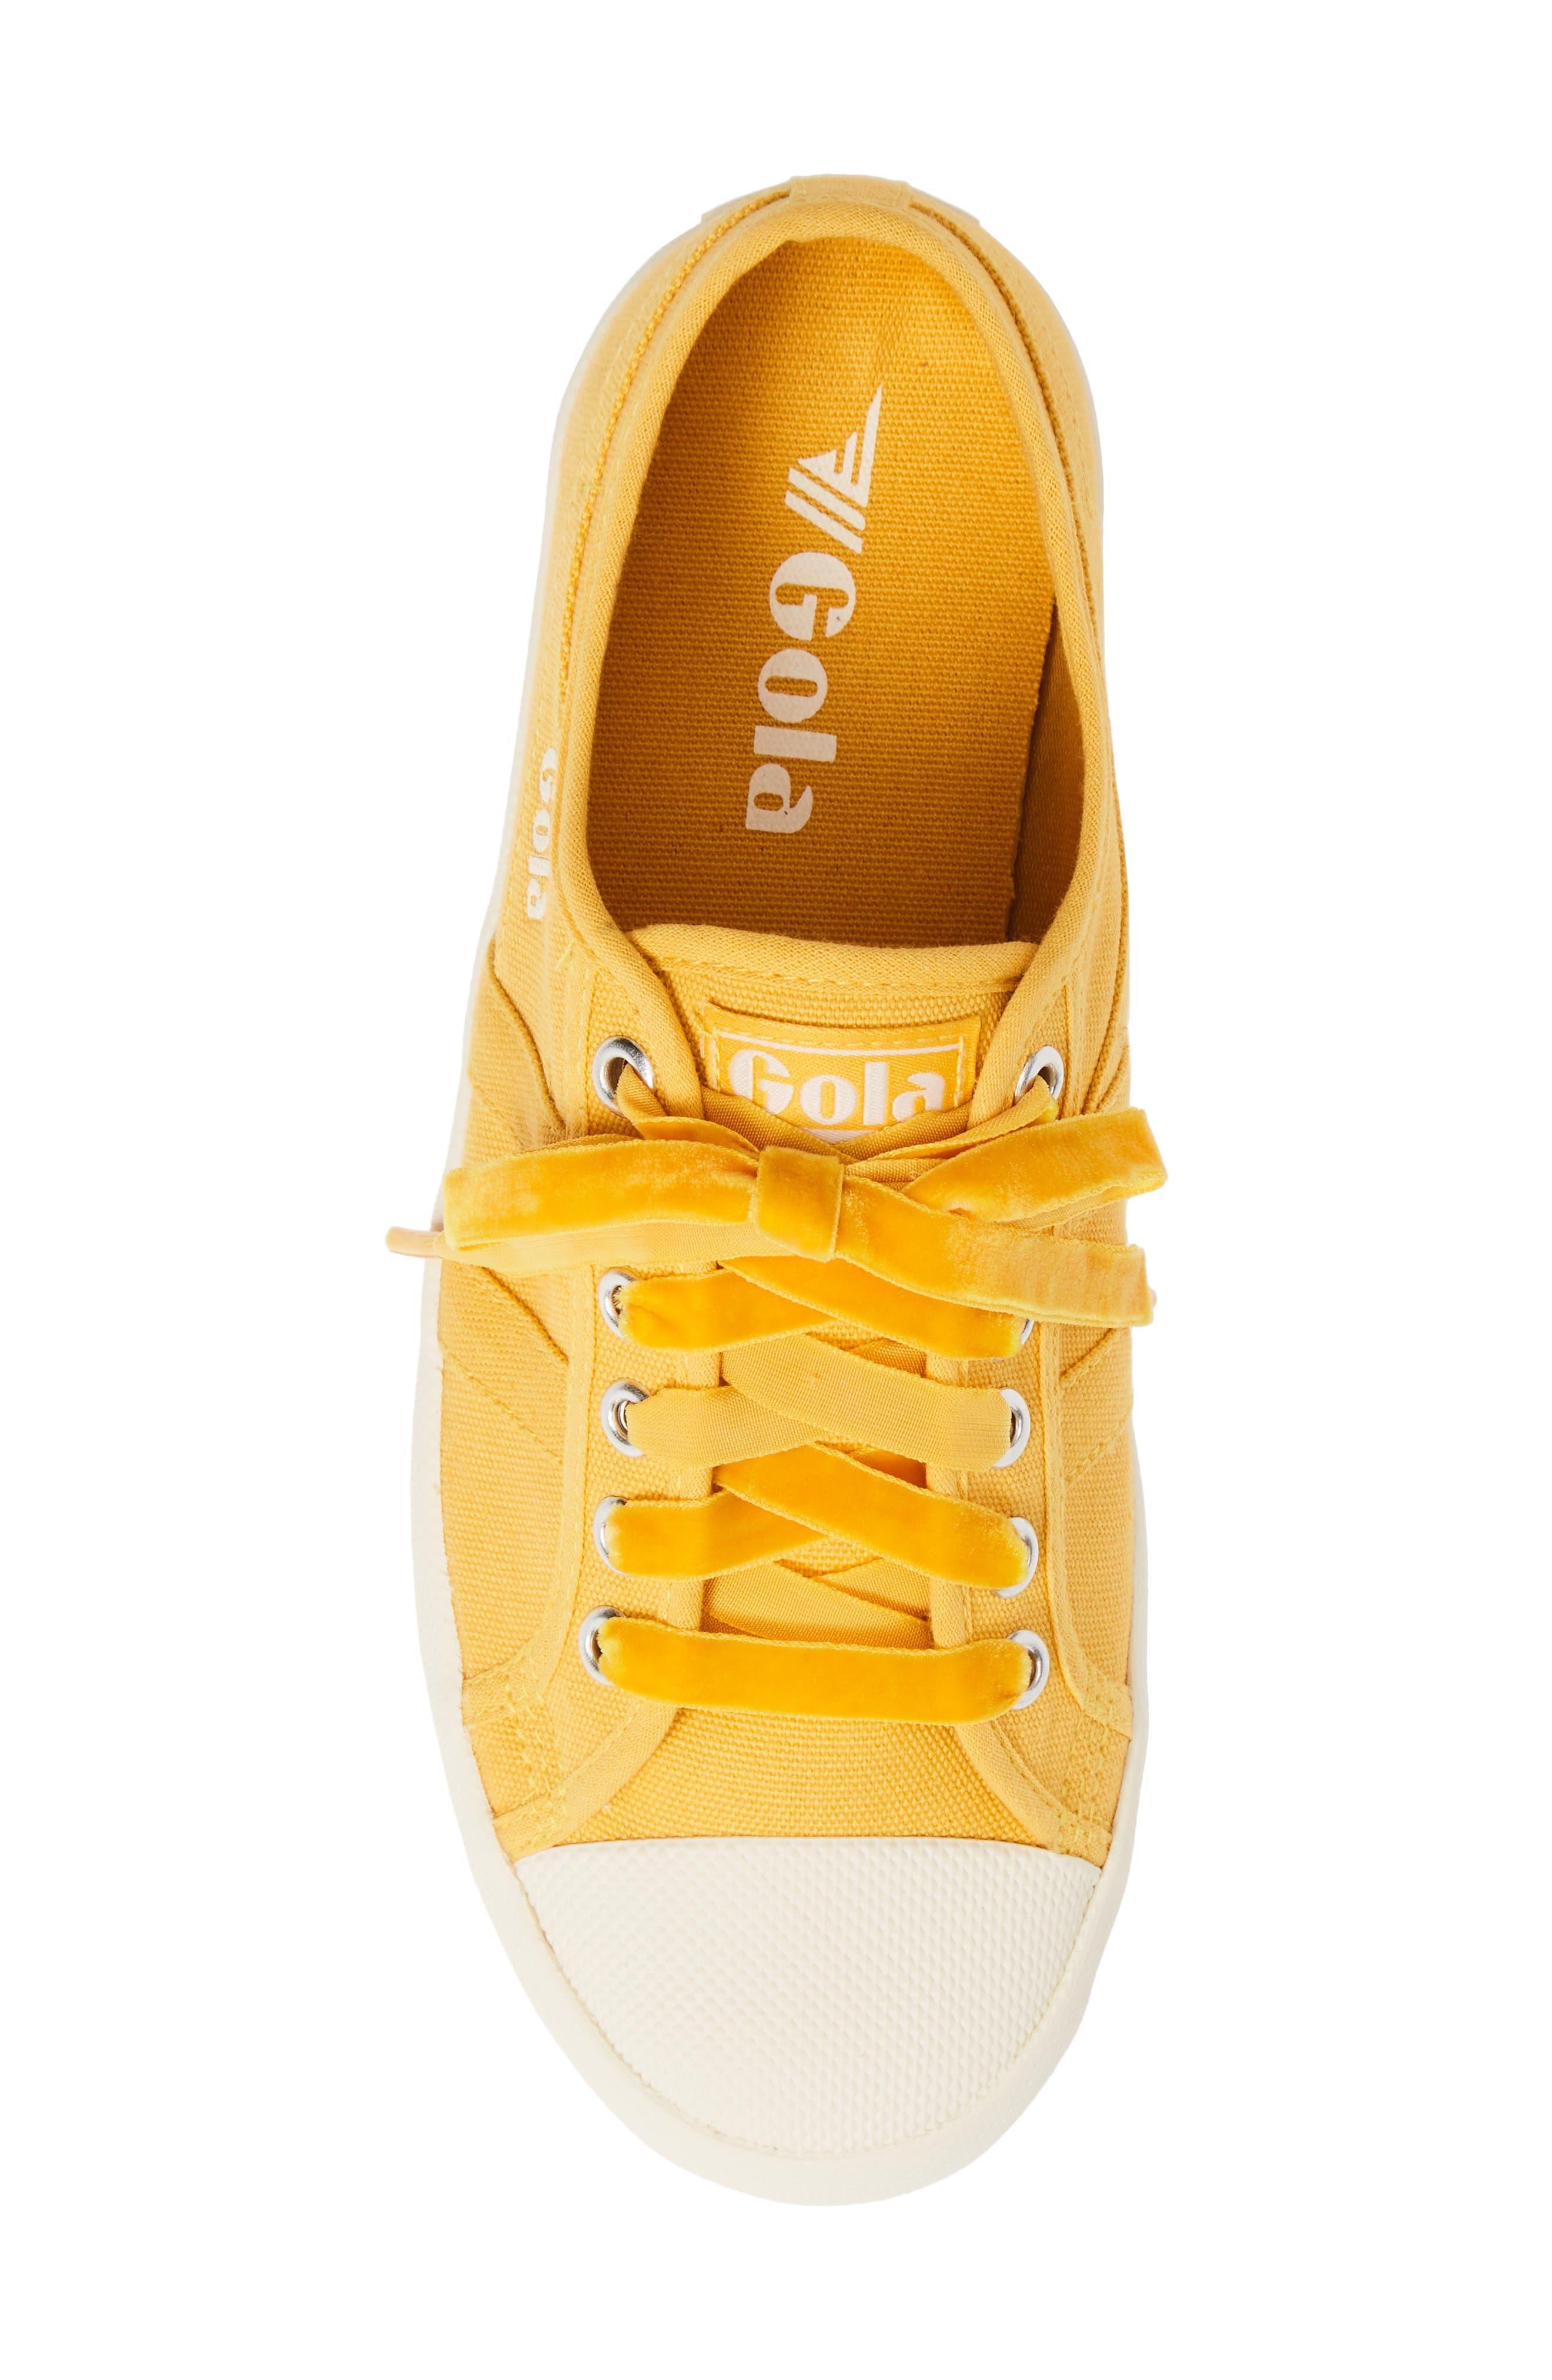 Coaster Sneaker,                             Alternate thumbnail 5, color,                             SUN/ OFF WHITE